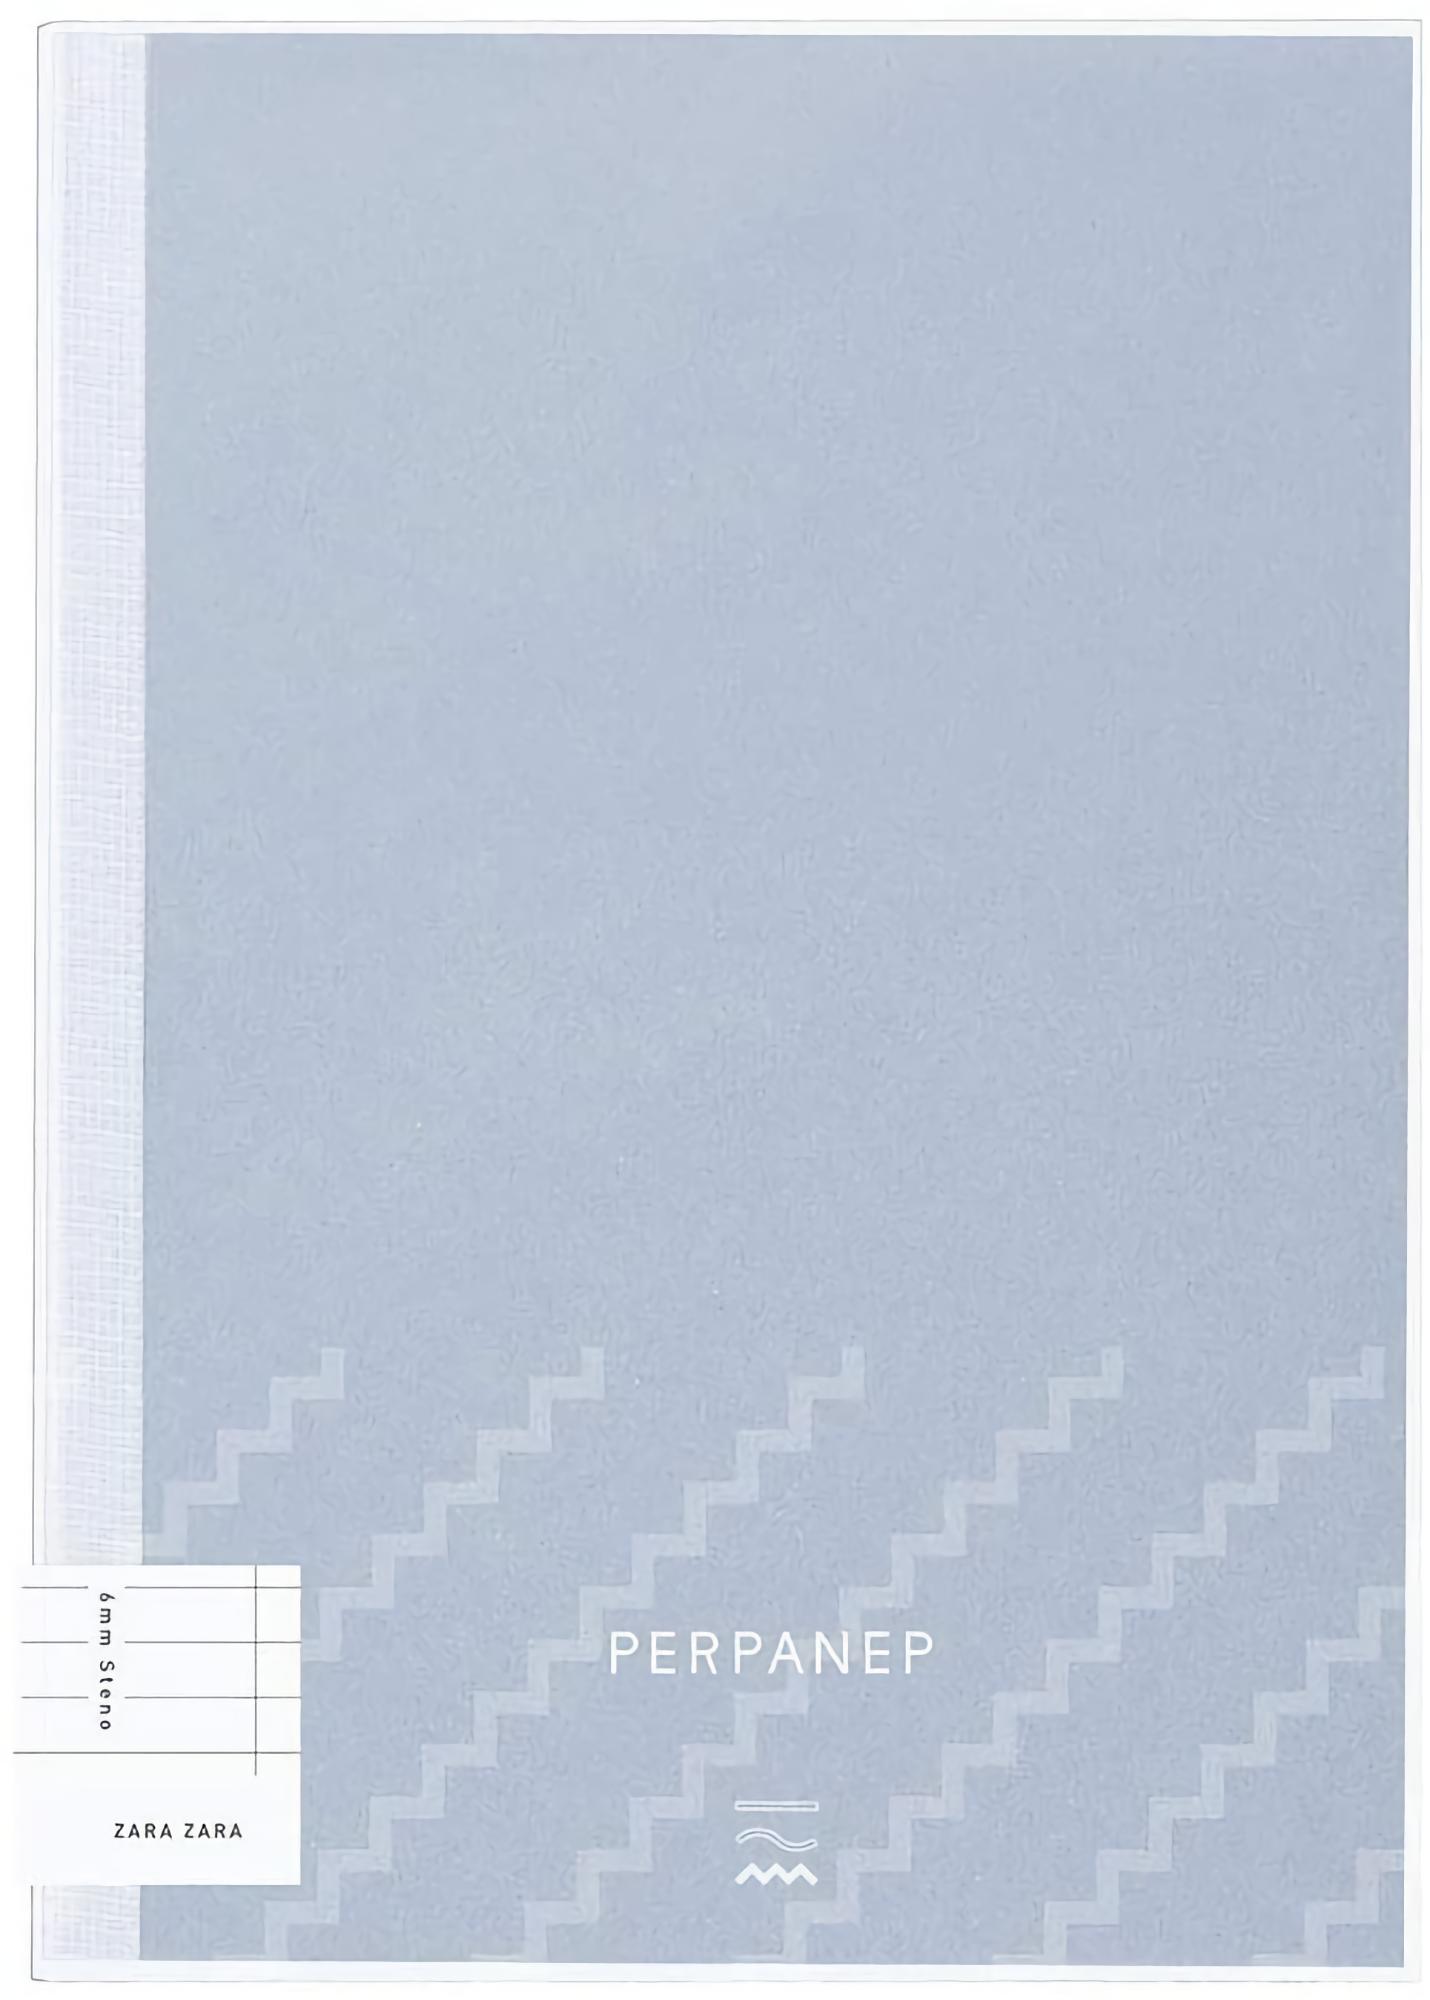 Kokuyo PERPANEP Notebook - Zara Zara A5 6 mm Steno